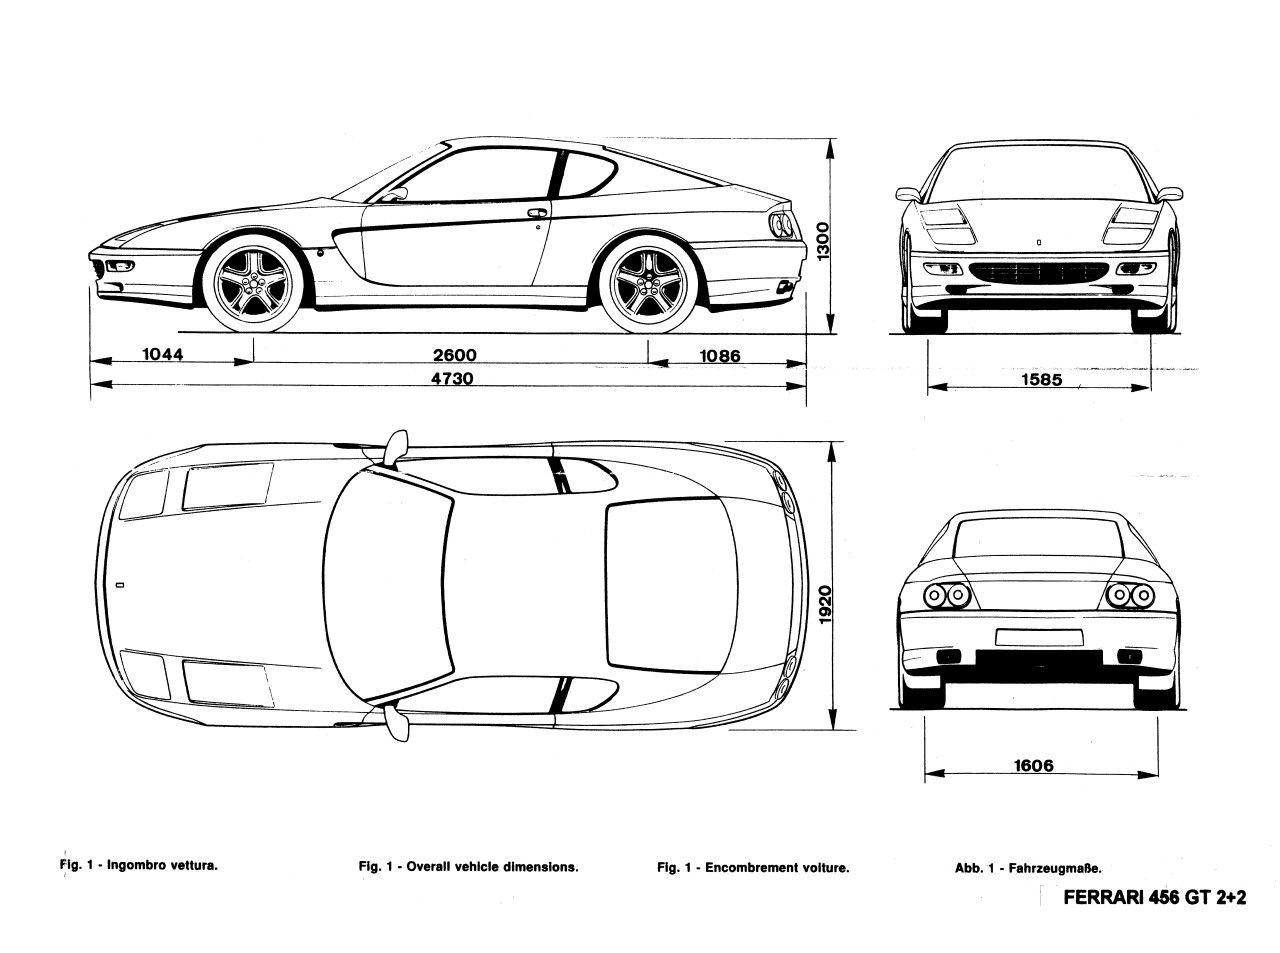 Ferrari 456 gt | Blueprints | Pinterest | Ferrari 456, Ferrari and Cars